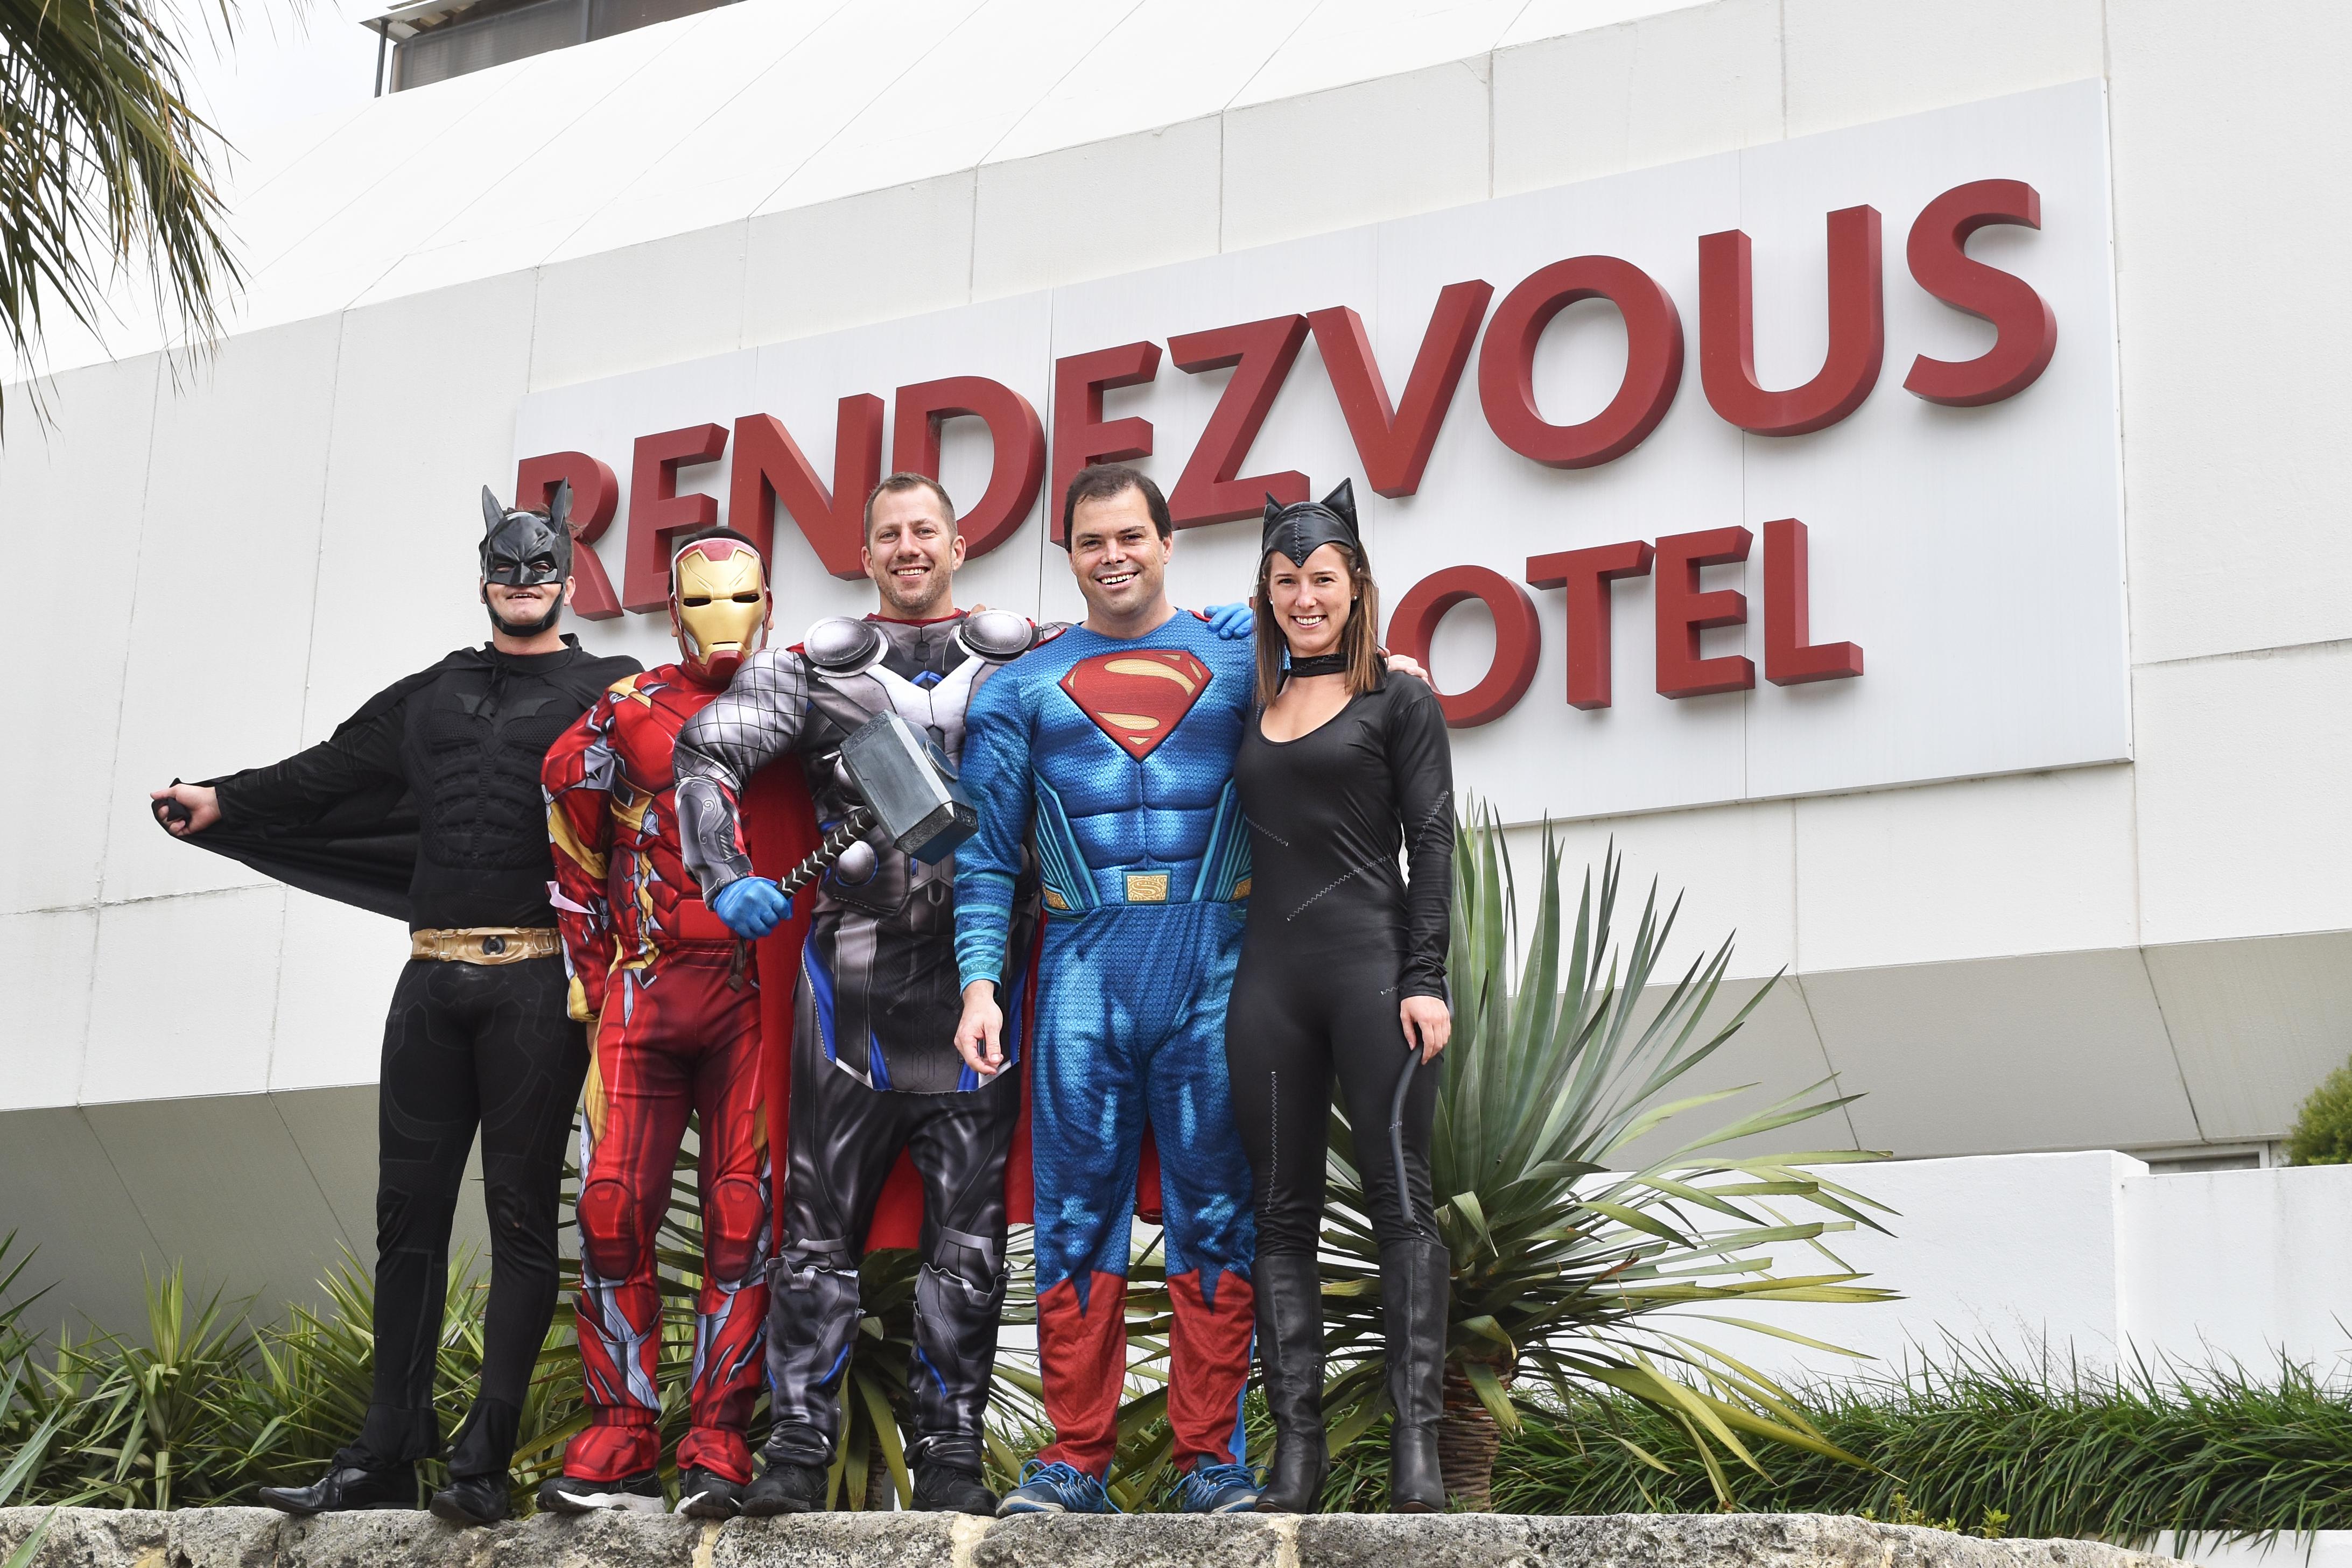 Rendezvous Hotel staff put in superhero effort for Super Boss Day